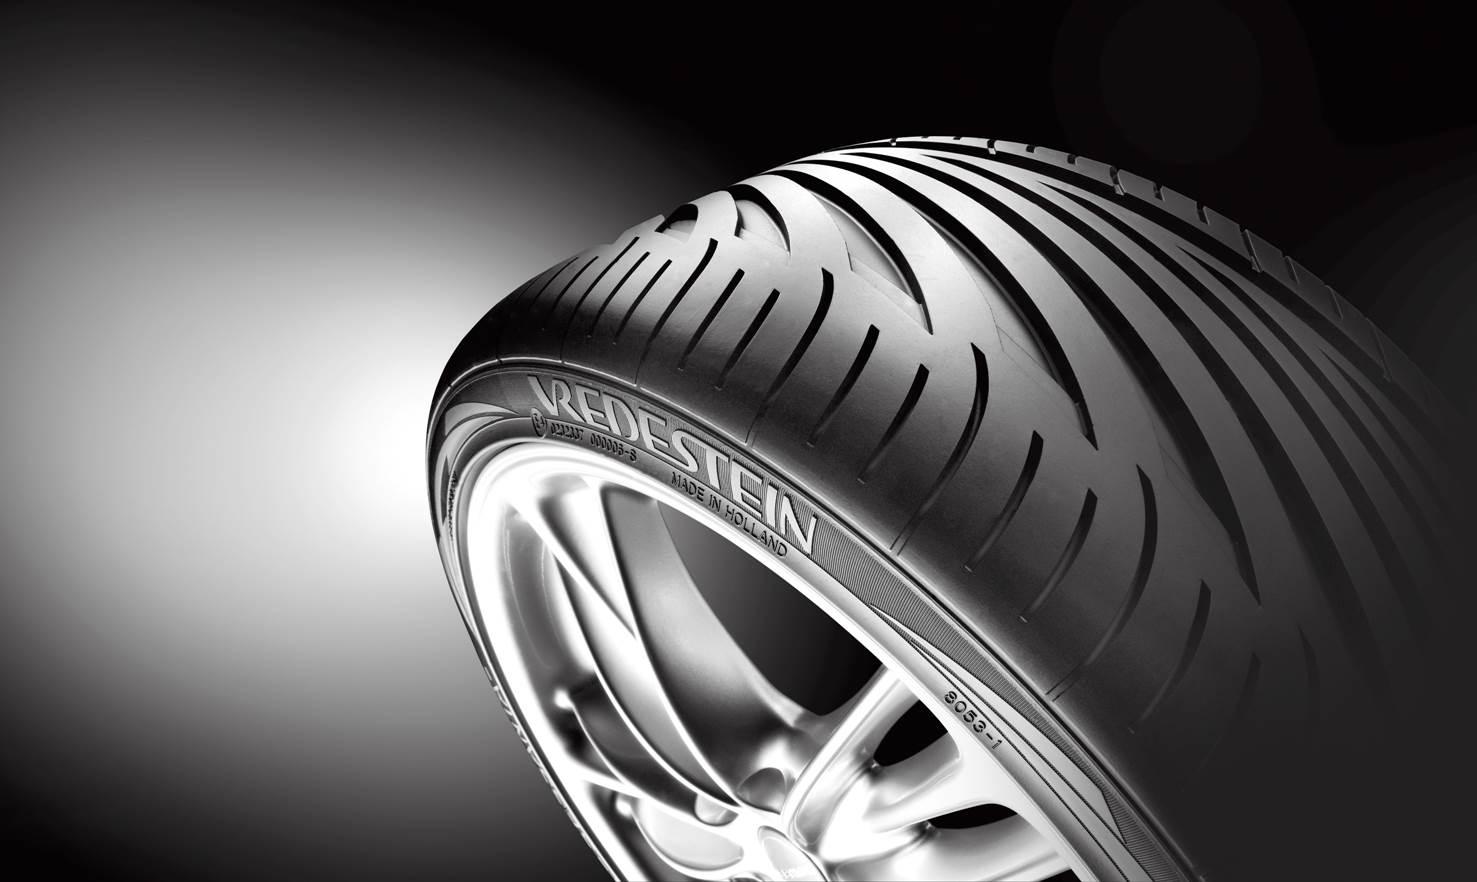 Apollo Tyres launches Vredestein brand in India